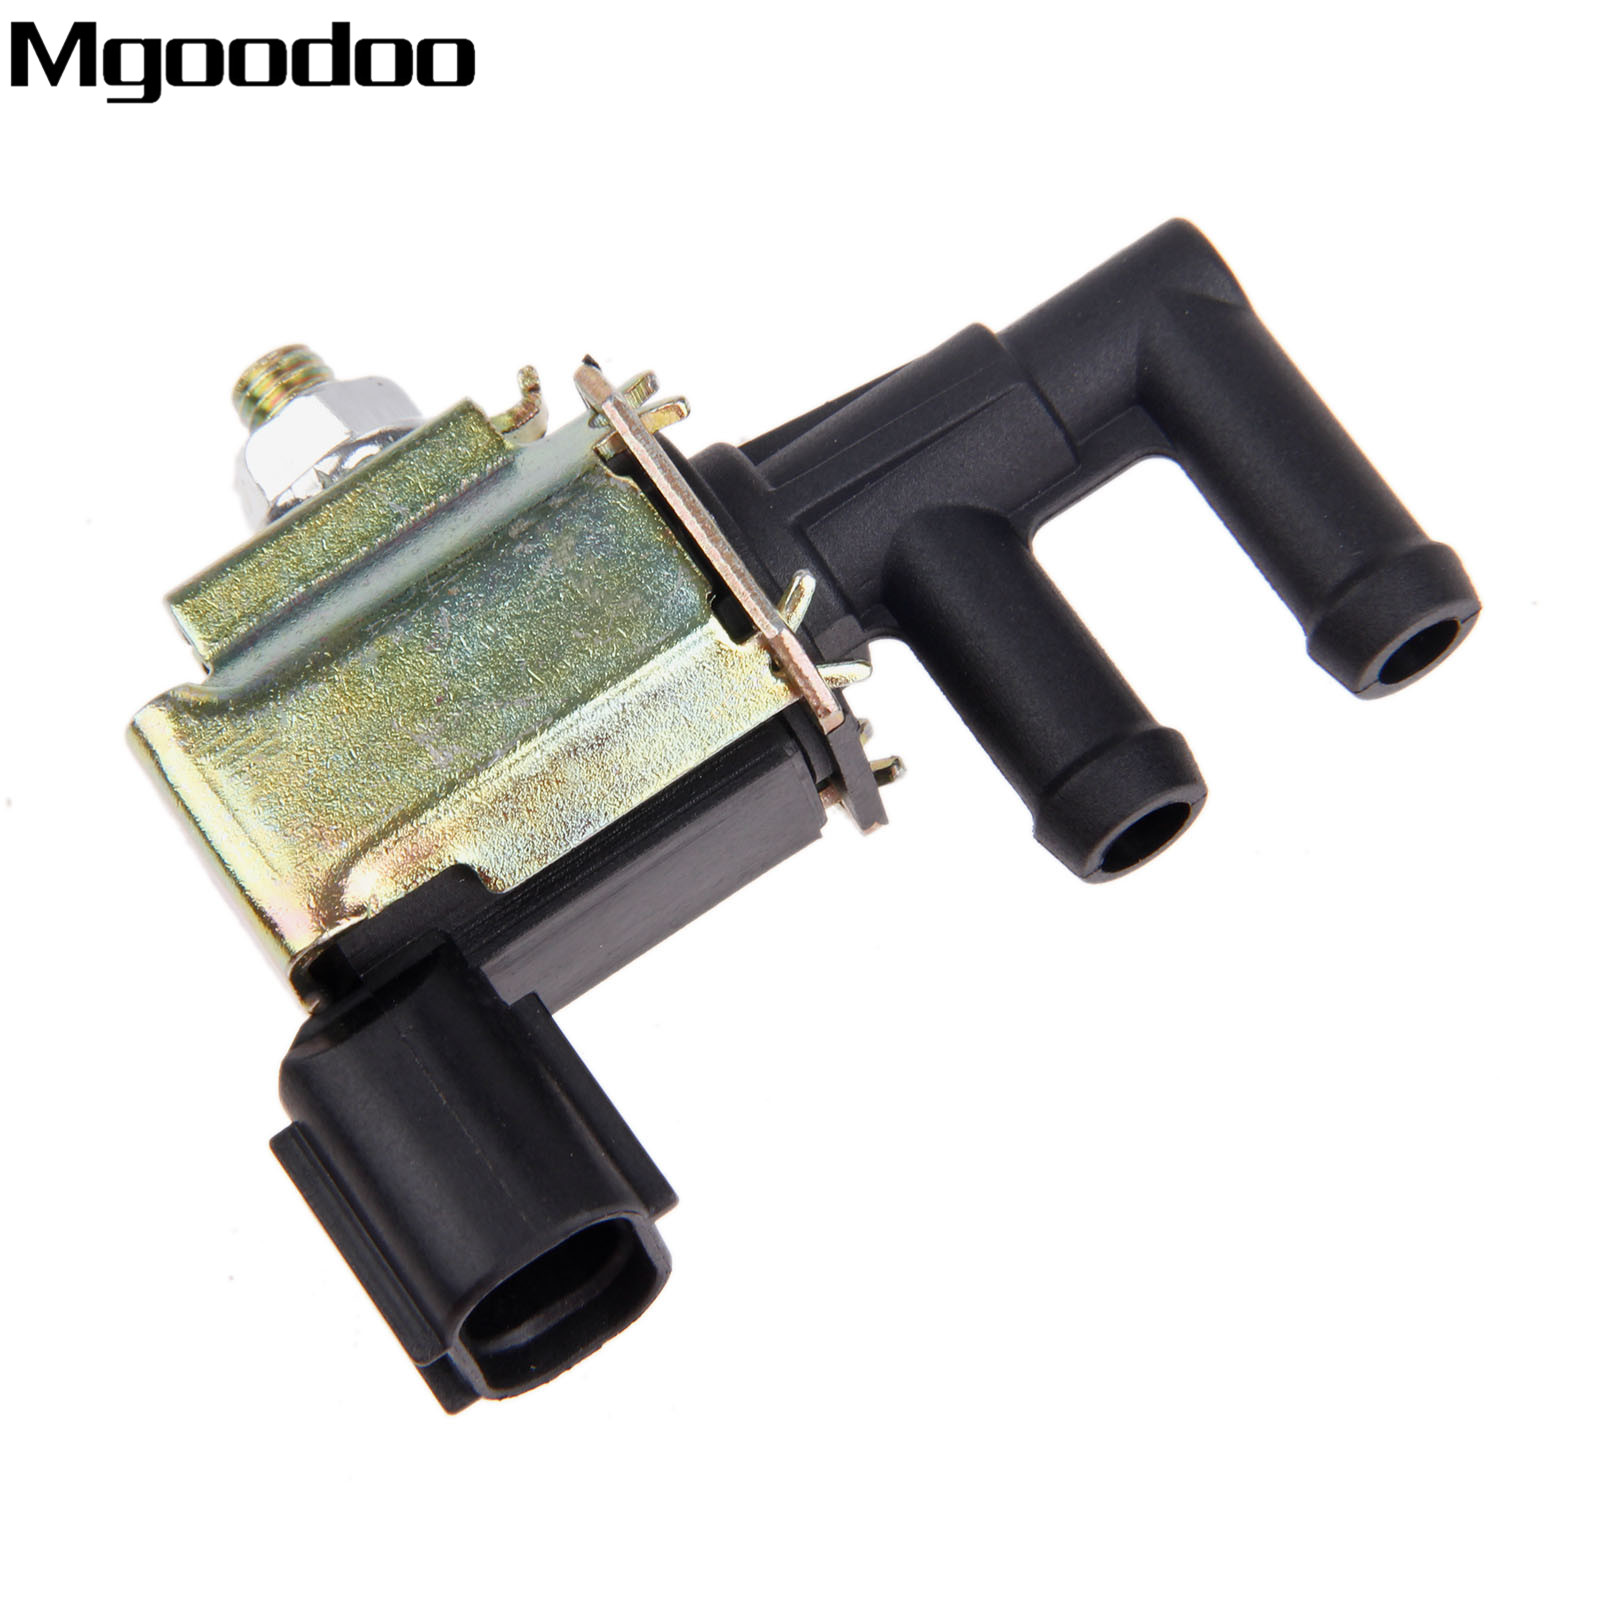 Golkar New Emission Vacuum Vlave Parts For Mitsubishi: 1Pc Emission Purge Control Solenoid Valve MR507781